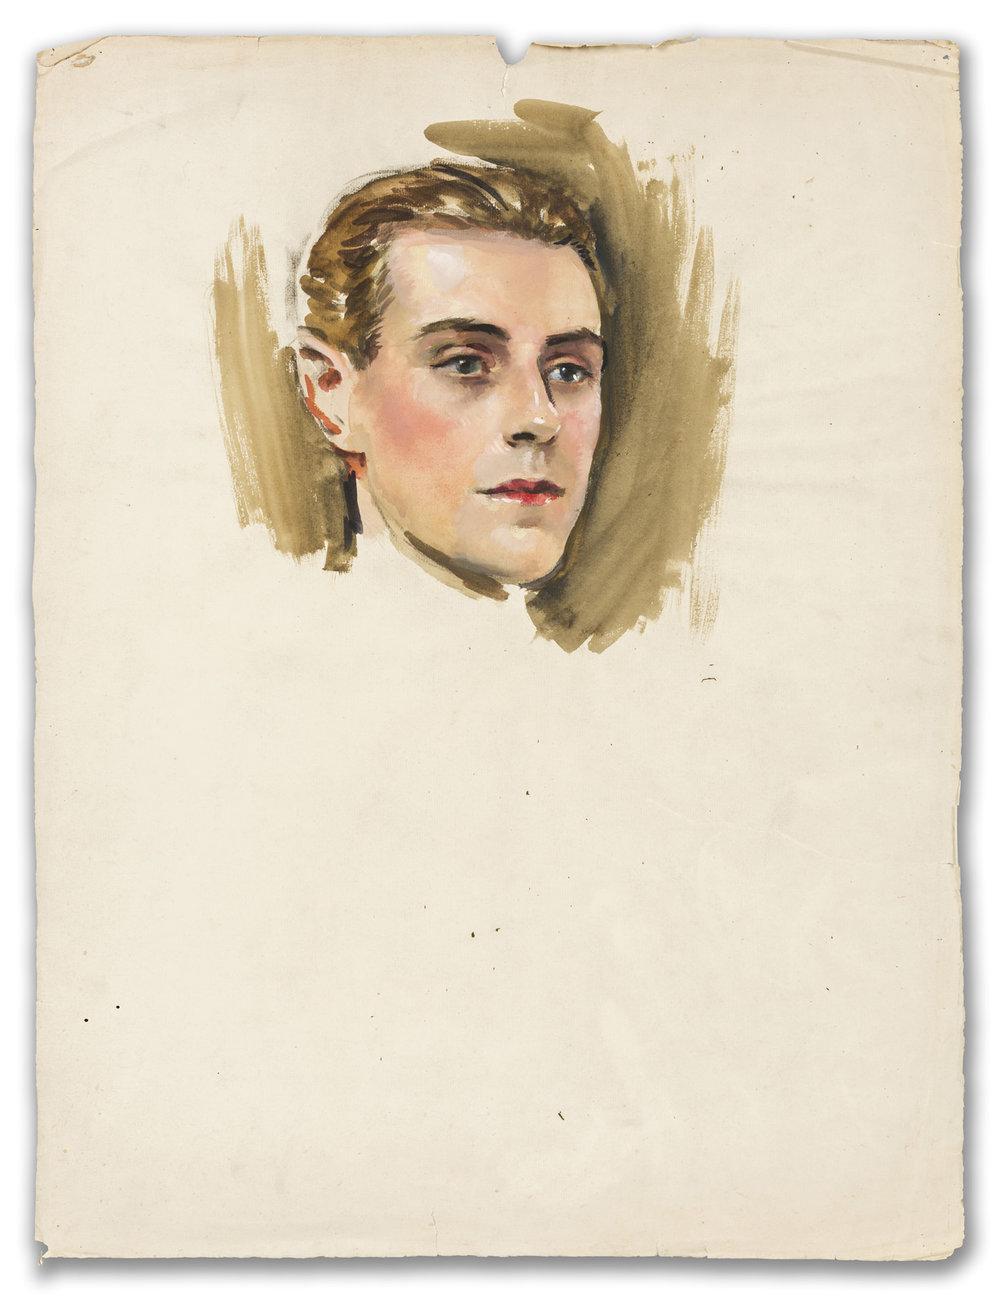 William Bruce Ellis Ranken, (British 1881-1941), Portrait of a Young Man, 1914.